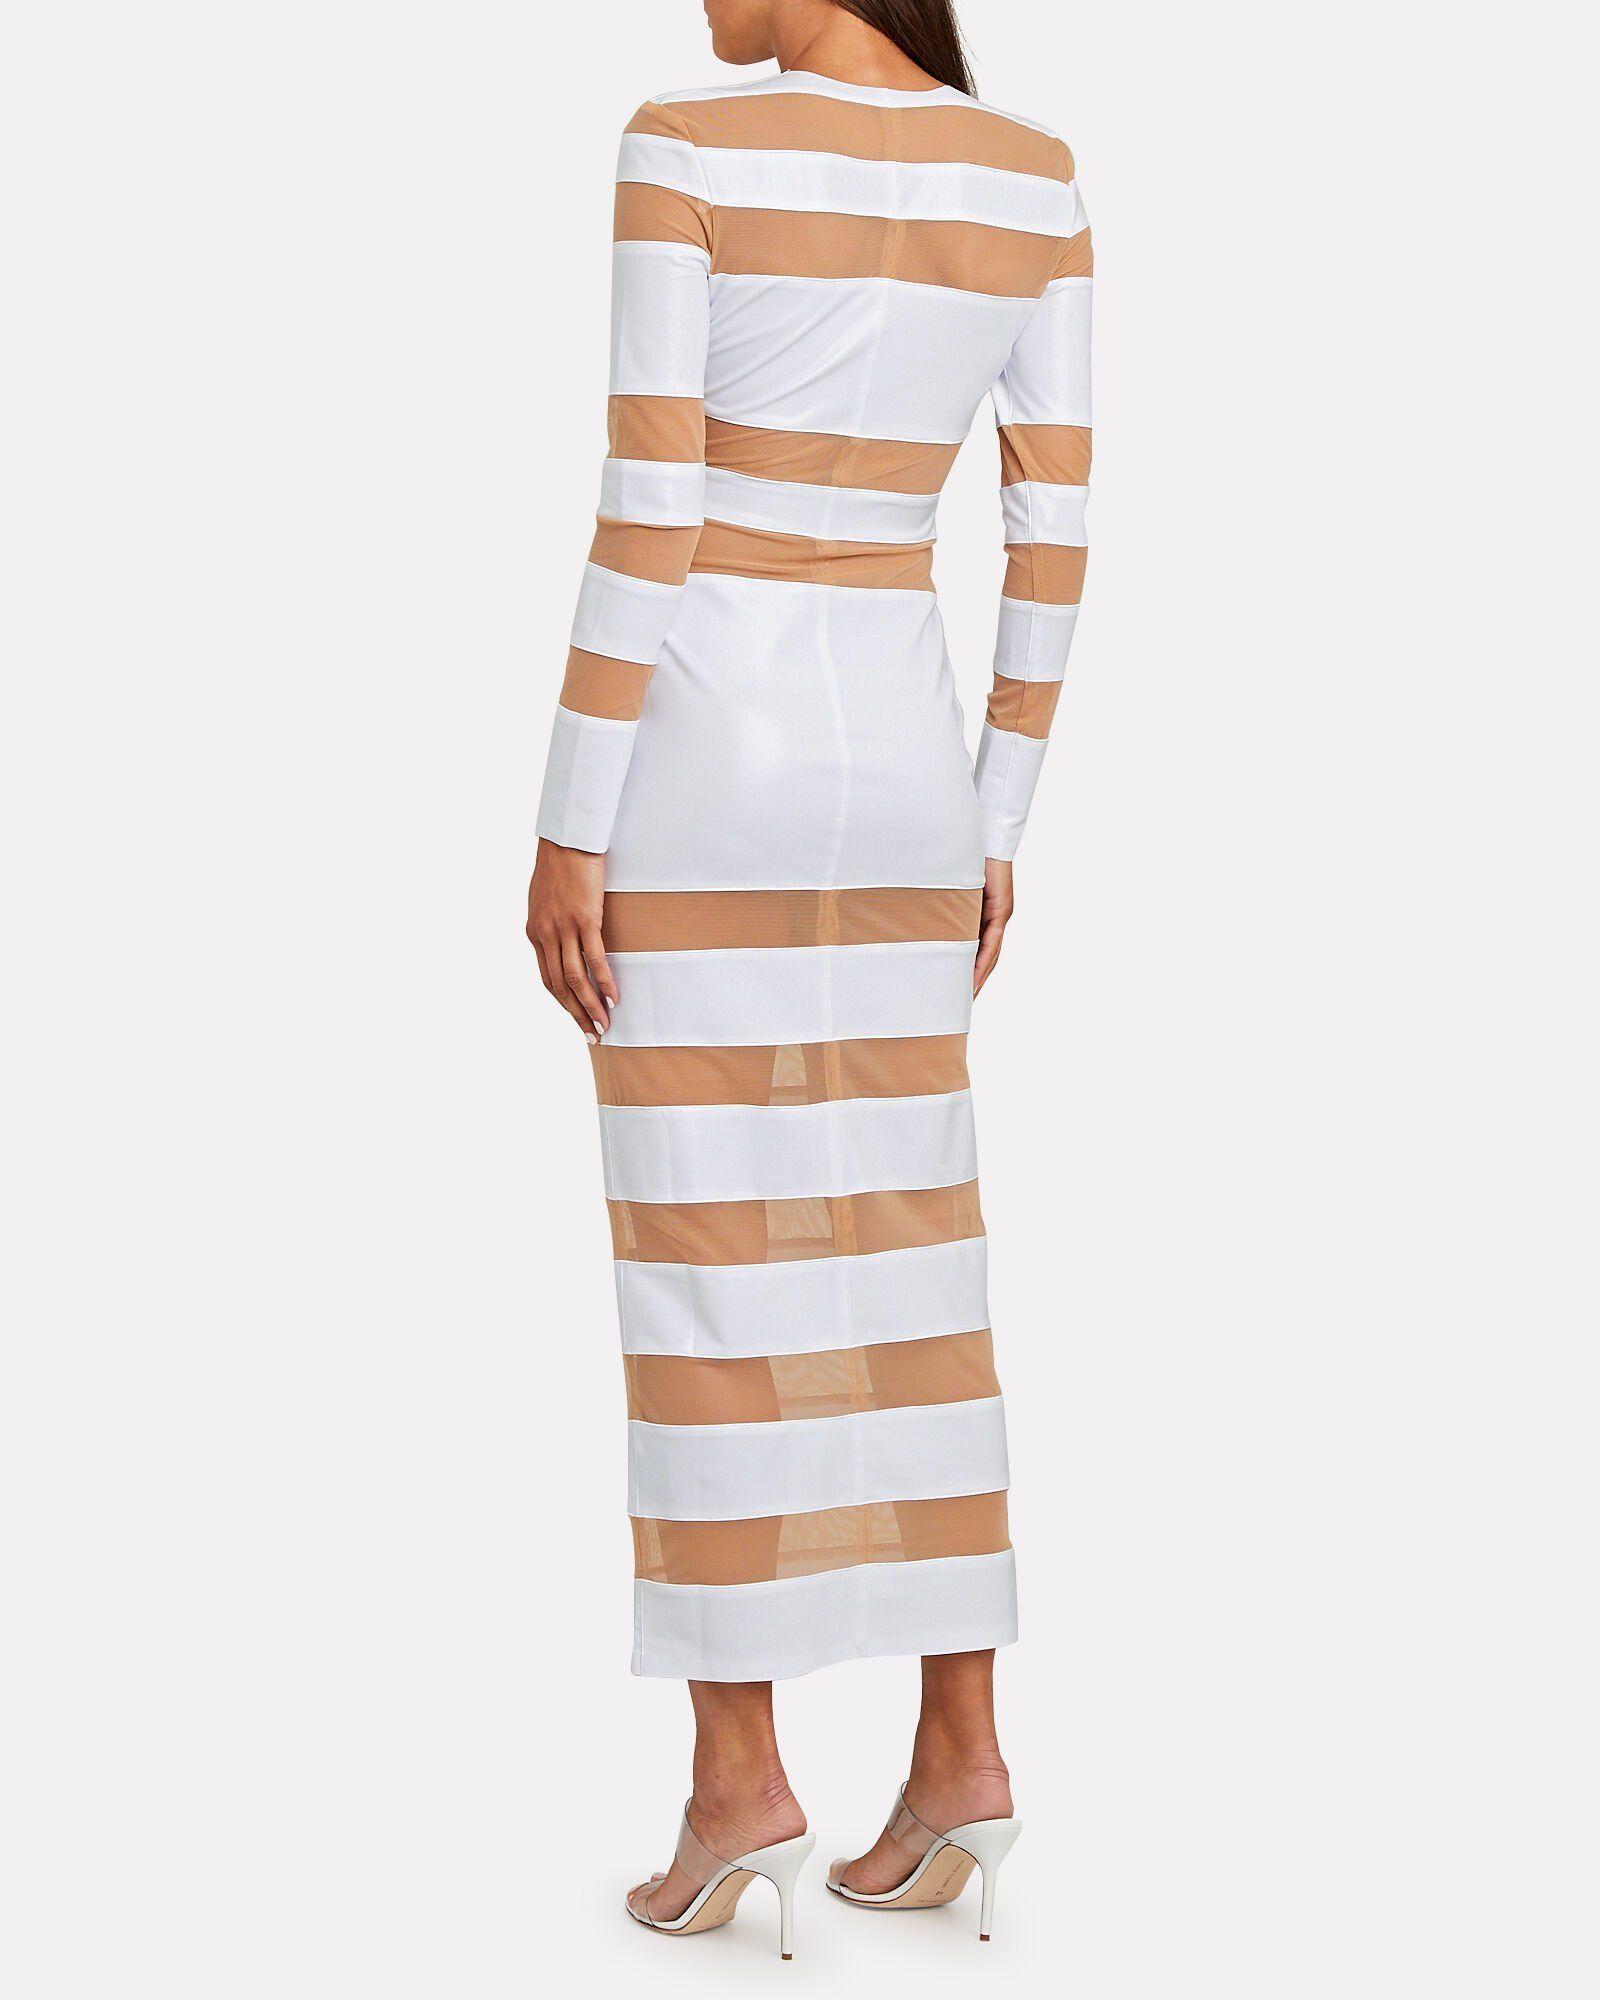 Splice Striped Sheer Knit Dress Knit Dress Striped Knit Dress Designer Knit Dresses [ 2000 x 1600 Pixel ]